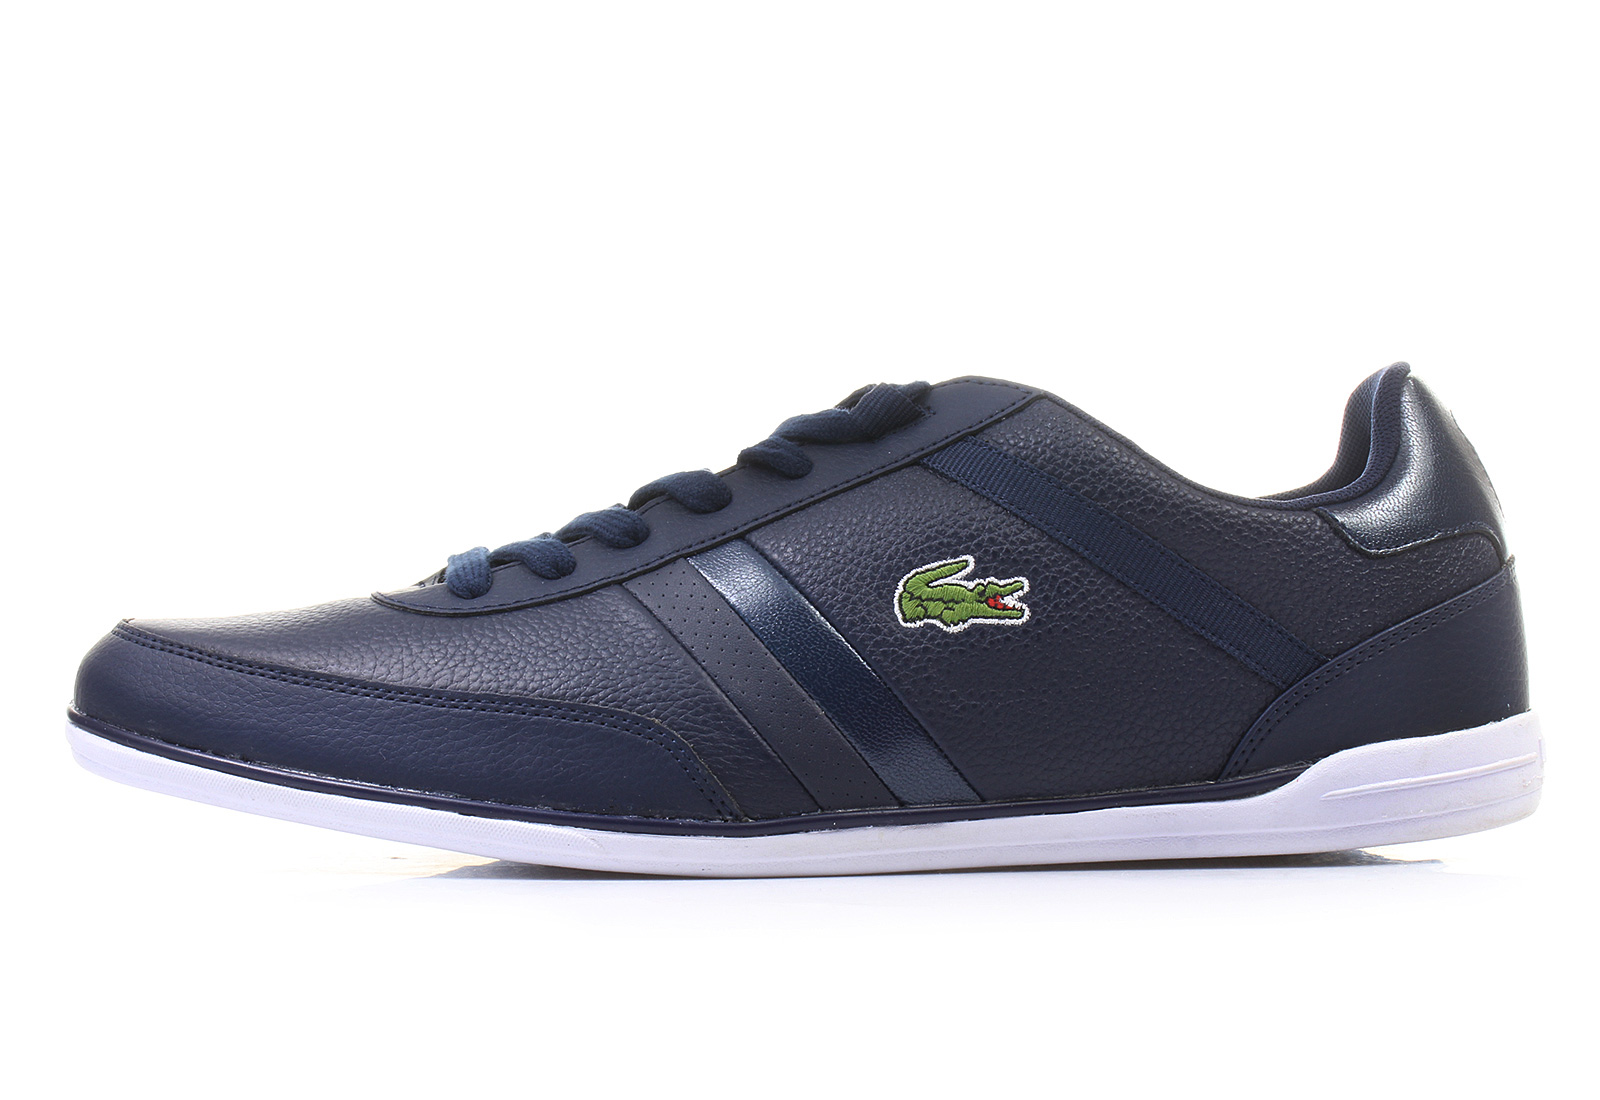 Lacoste Cipő - Giron - 143spm0065-db4 - Office Shoes Magyarország 84bb4f6b92